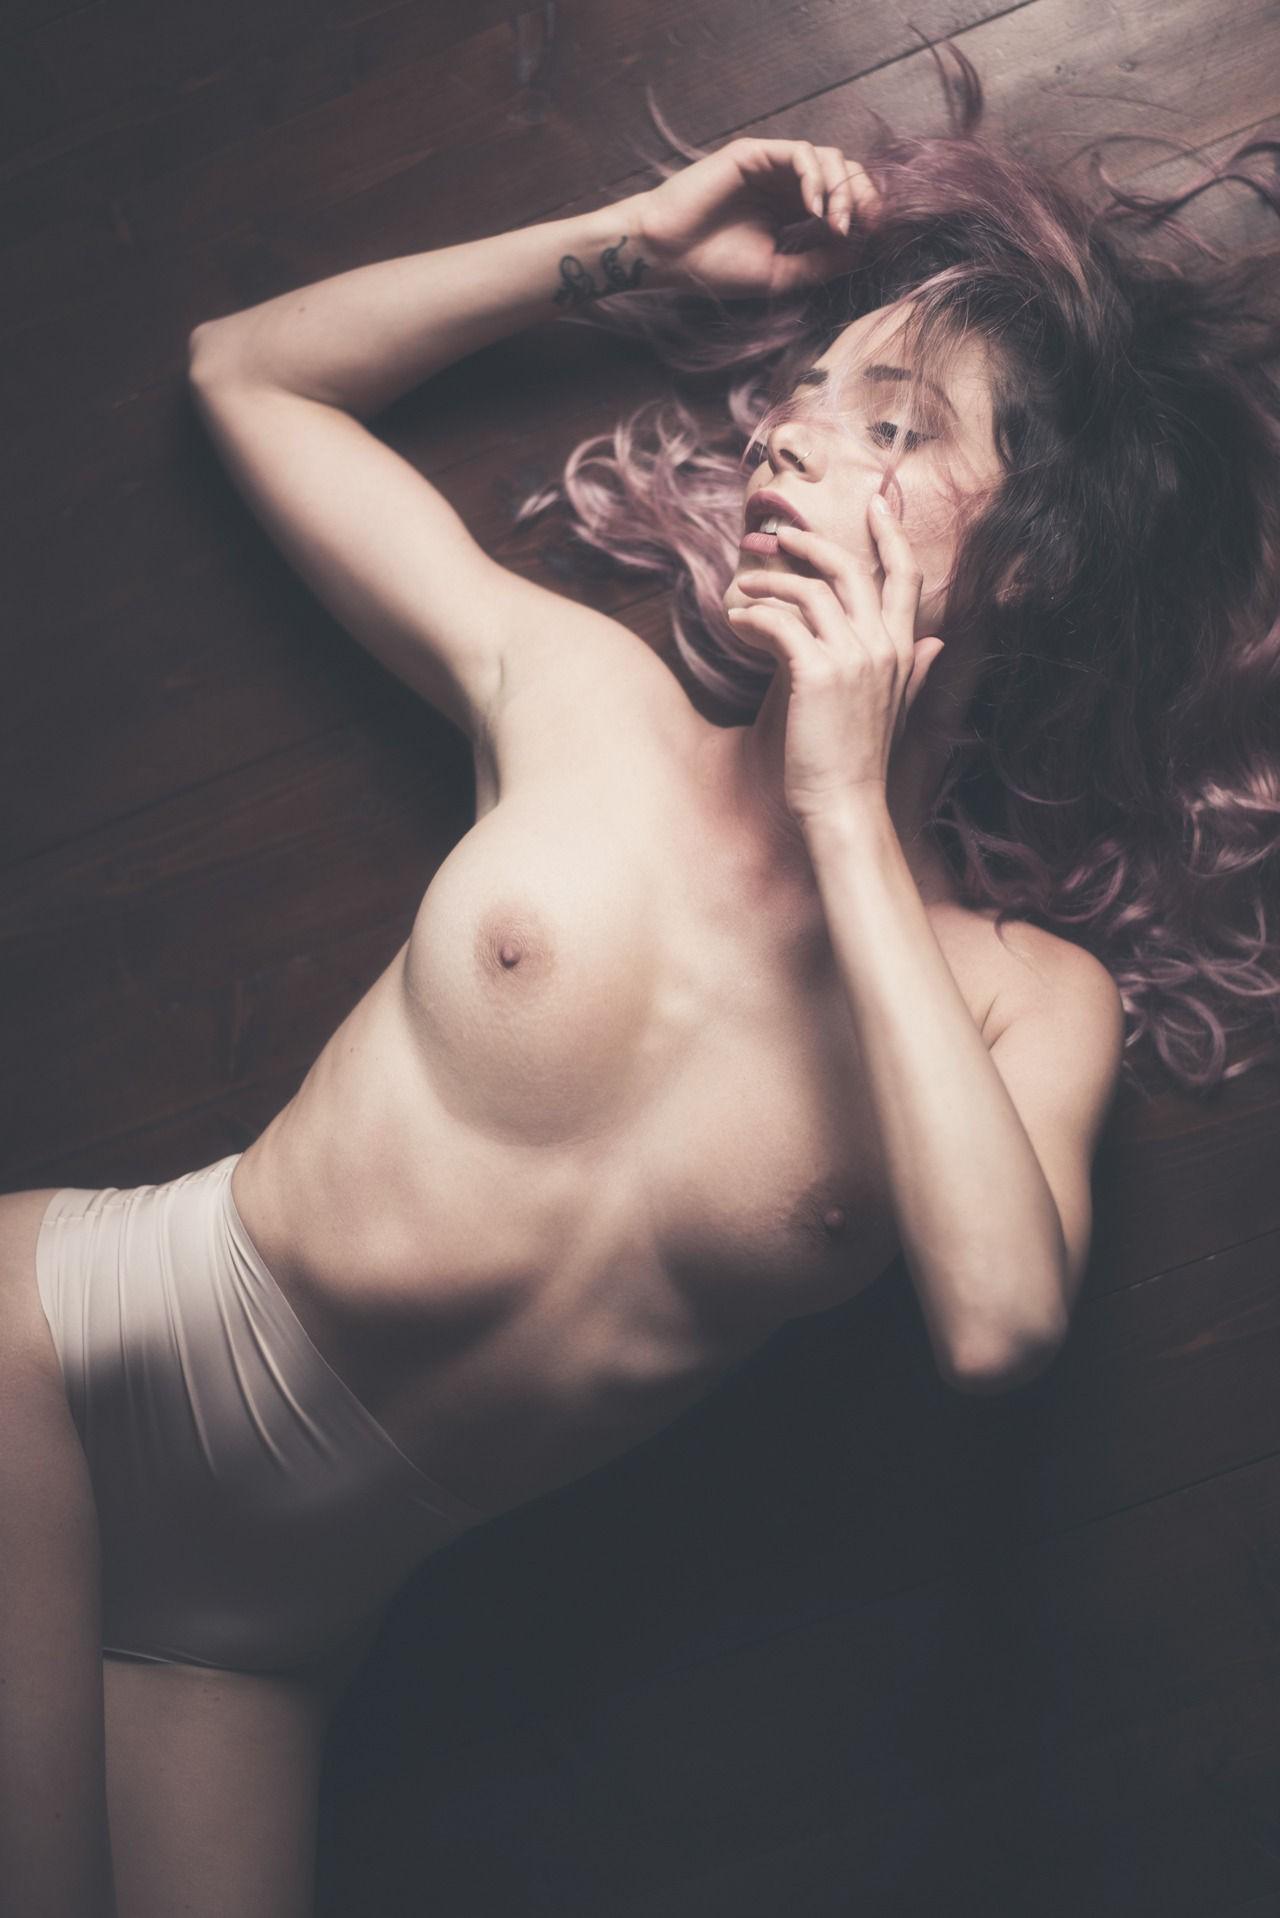 Gray headed grandmother nudes photos